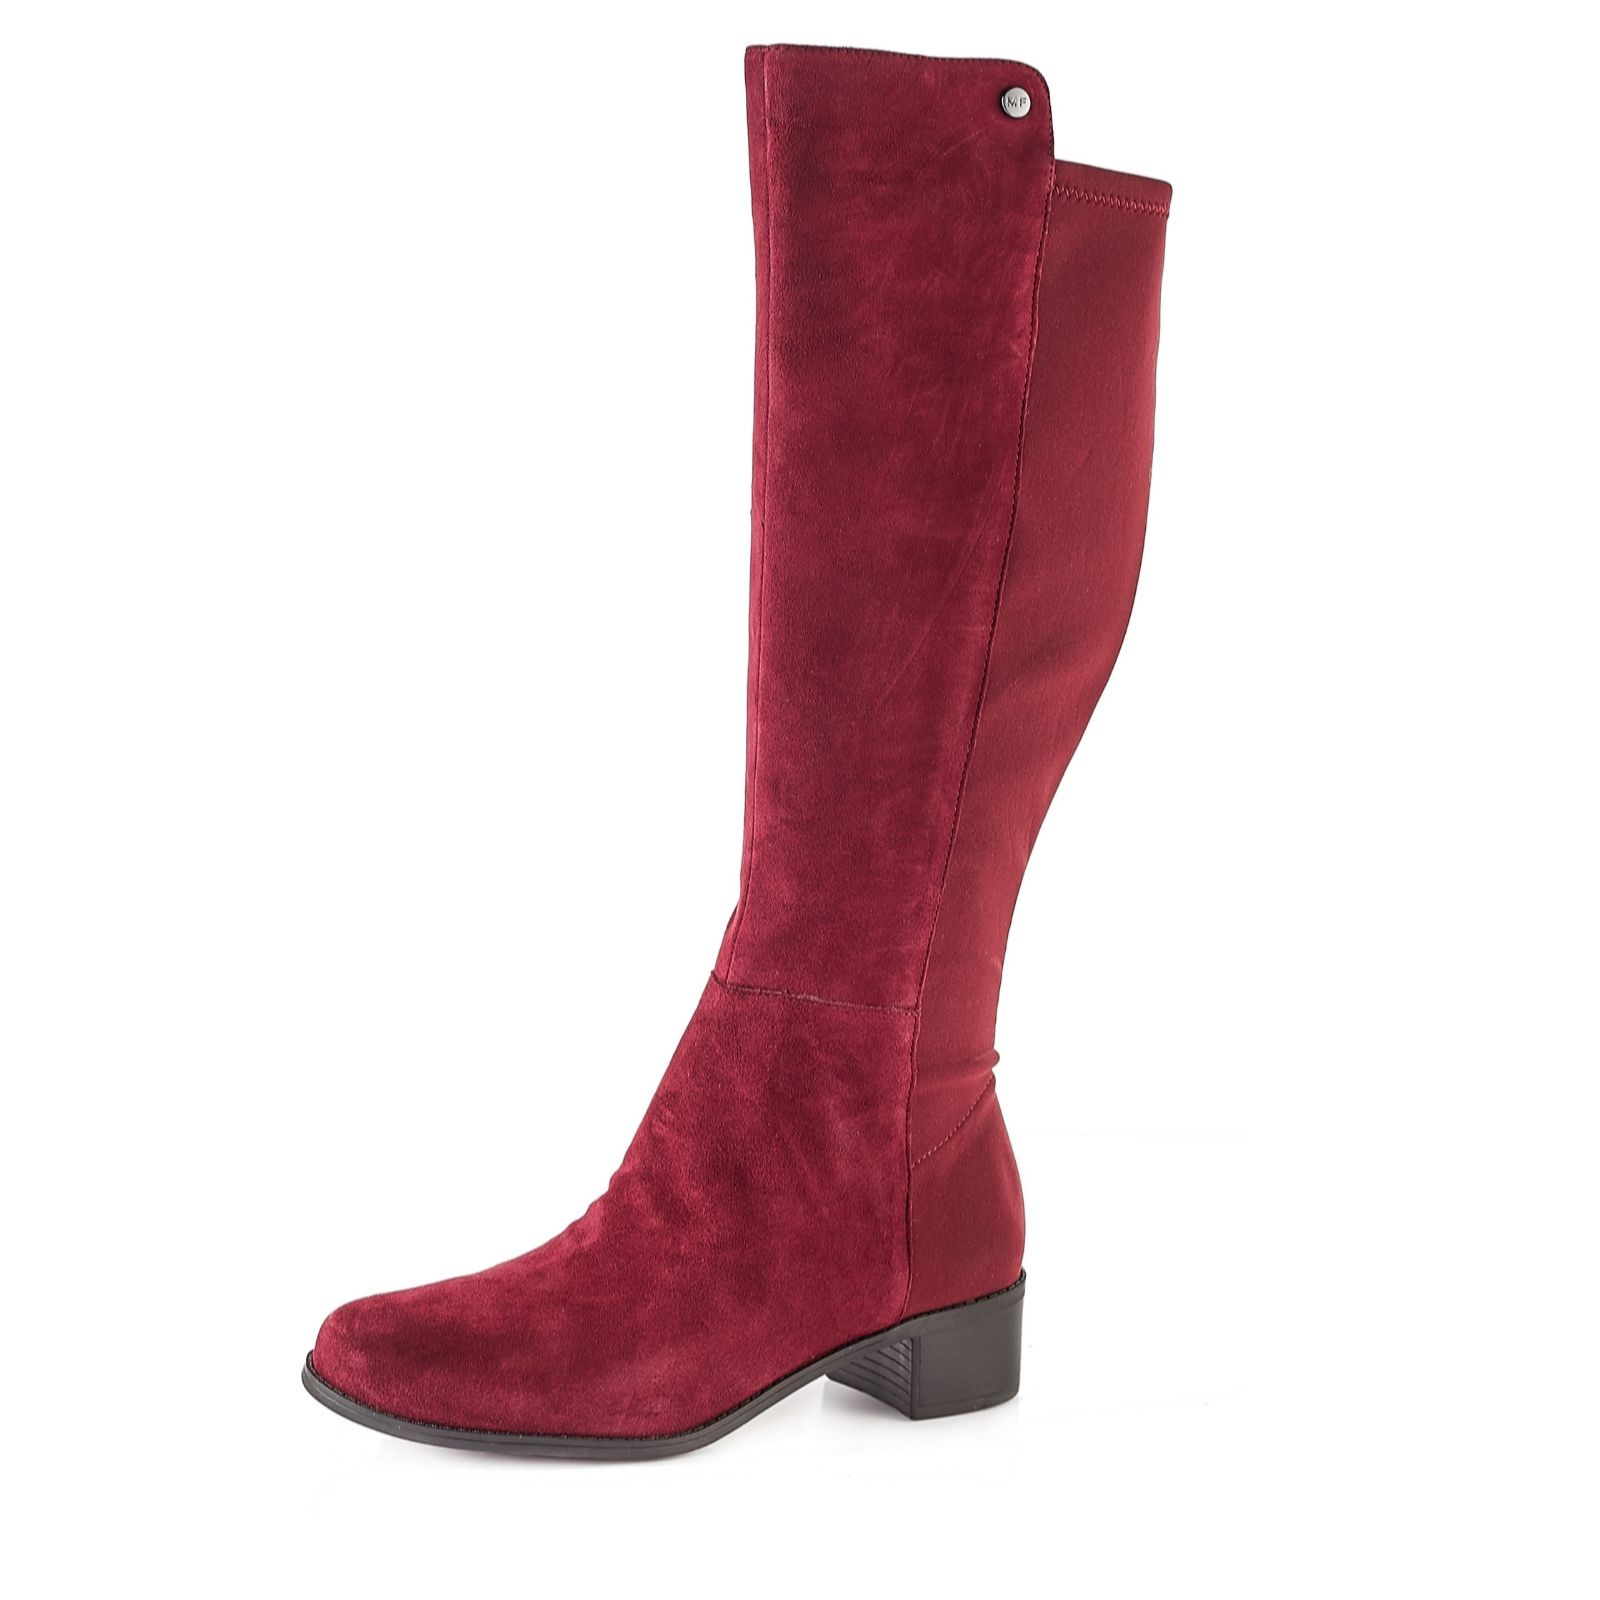 4be15d89583 Marc Fisher Irisy Leather Knee High Boot Standard Calf Width - QVC UK